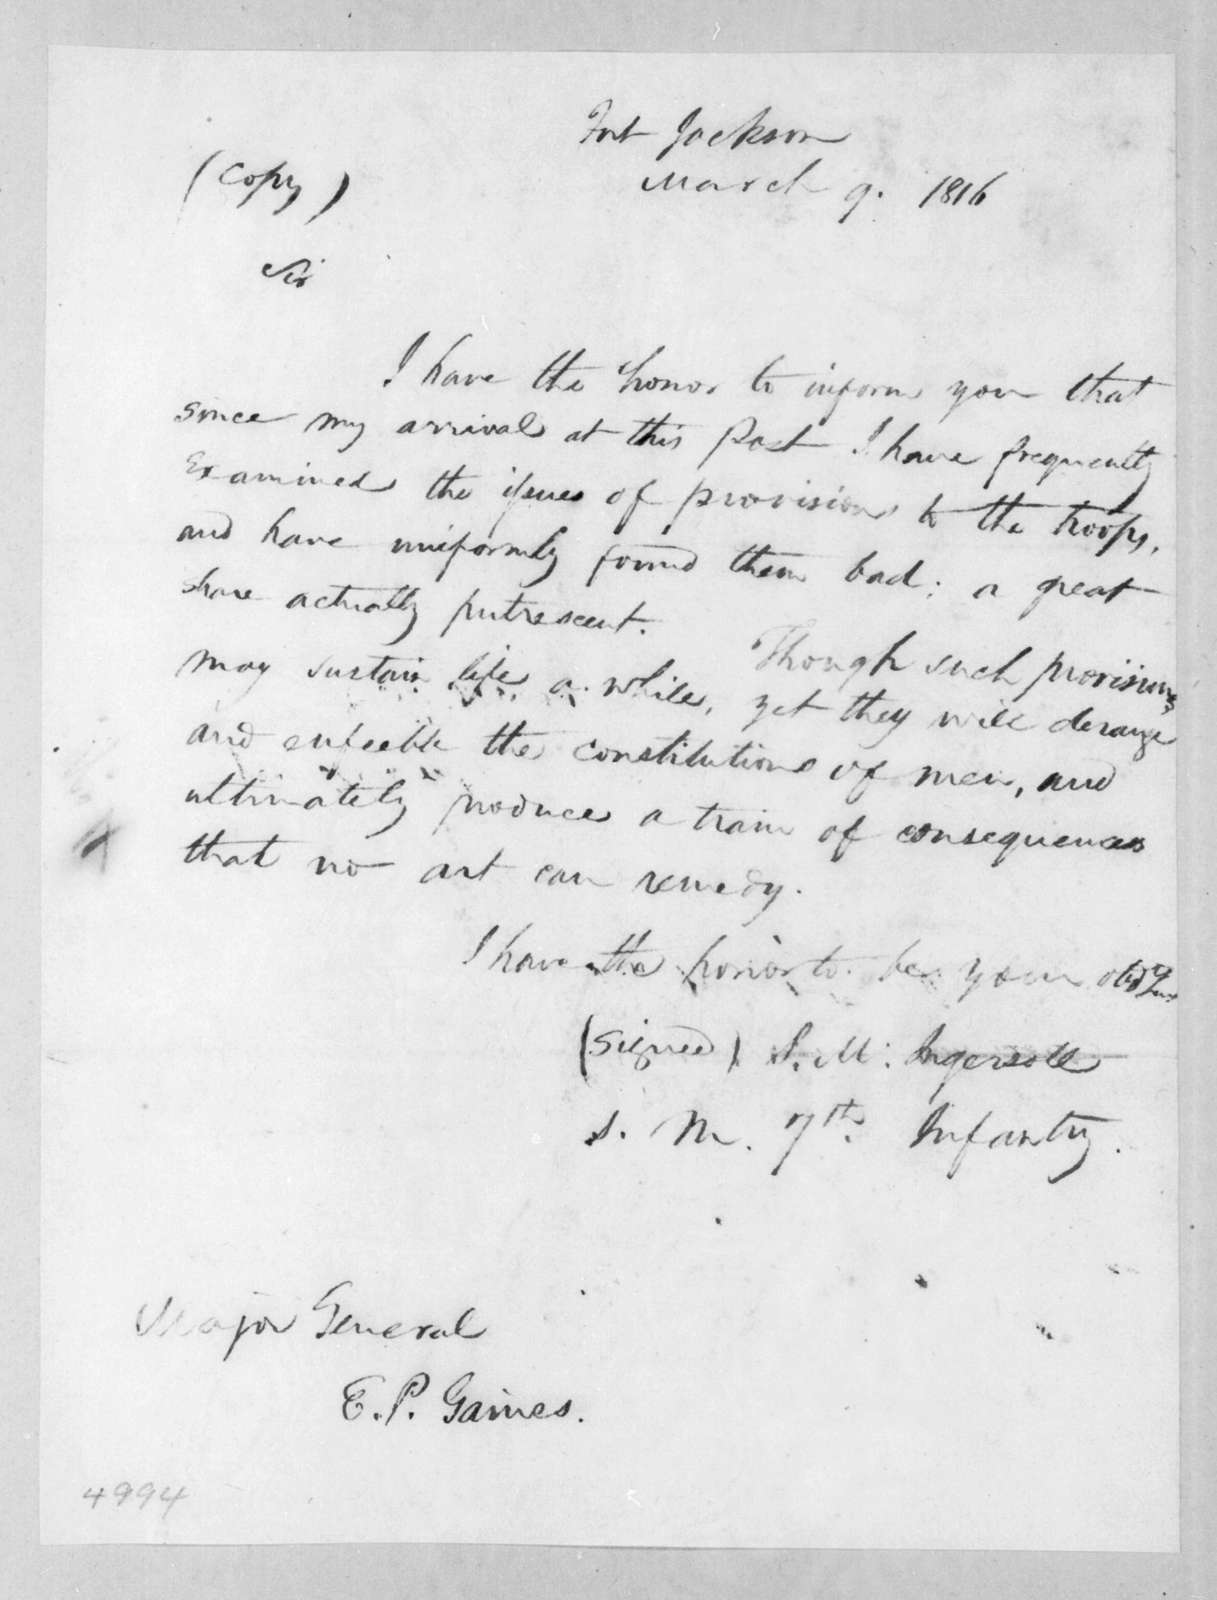 Stephen M. Ingersoll to Edmund Pendleton Gaines, March 9, 1816